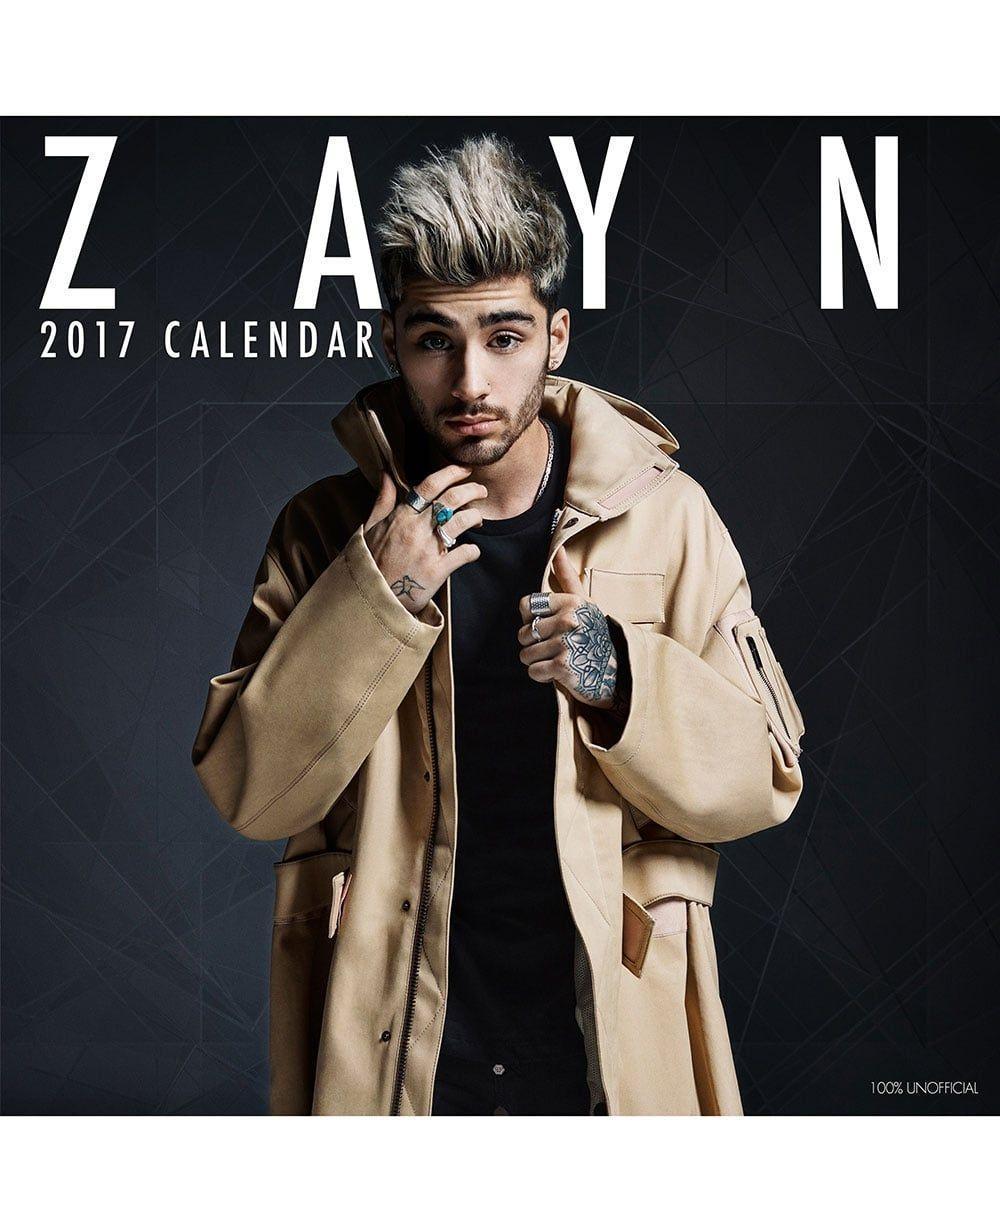 Zayn Malik 2017 Photoshoot | Gallery